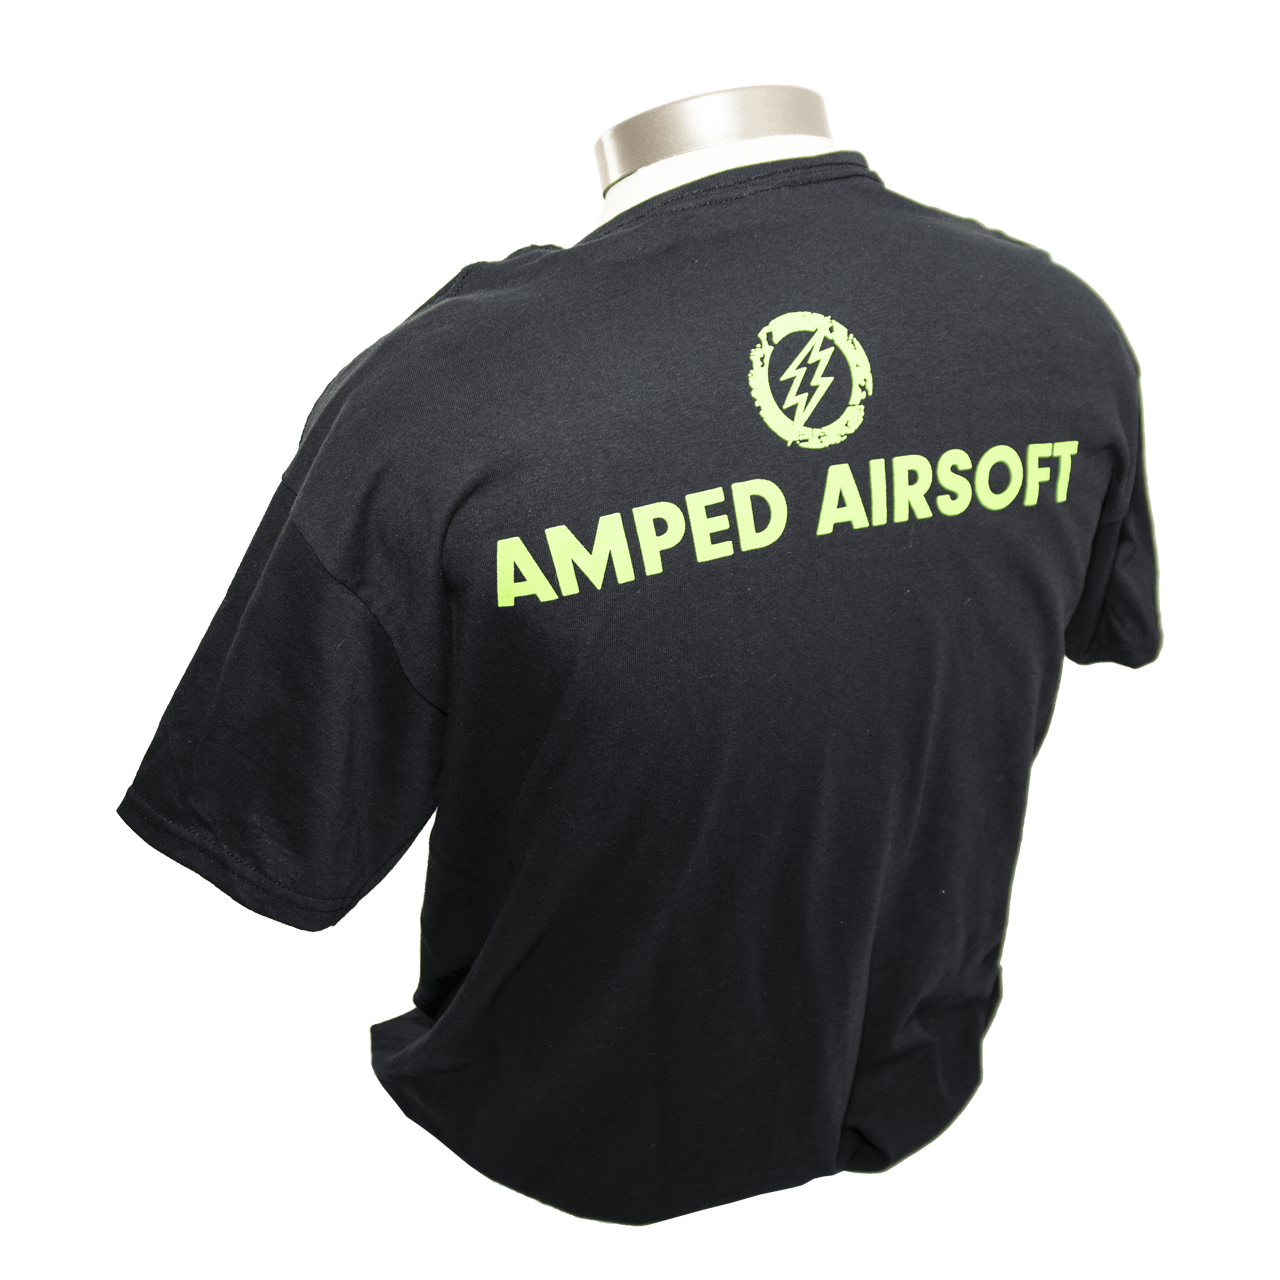 Amped Airsoft Small T-Shirt Green Splatter back